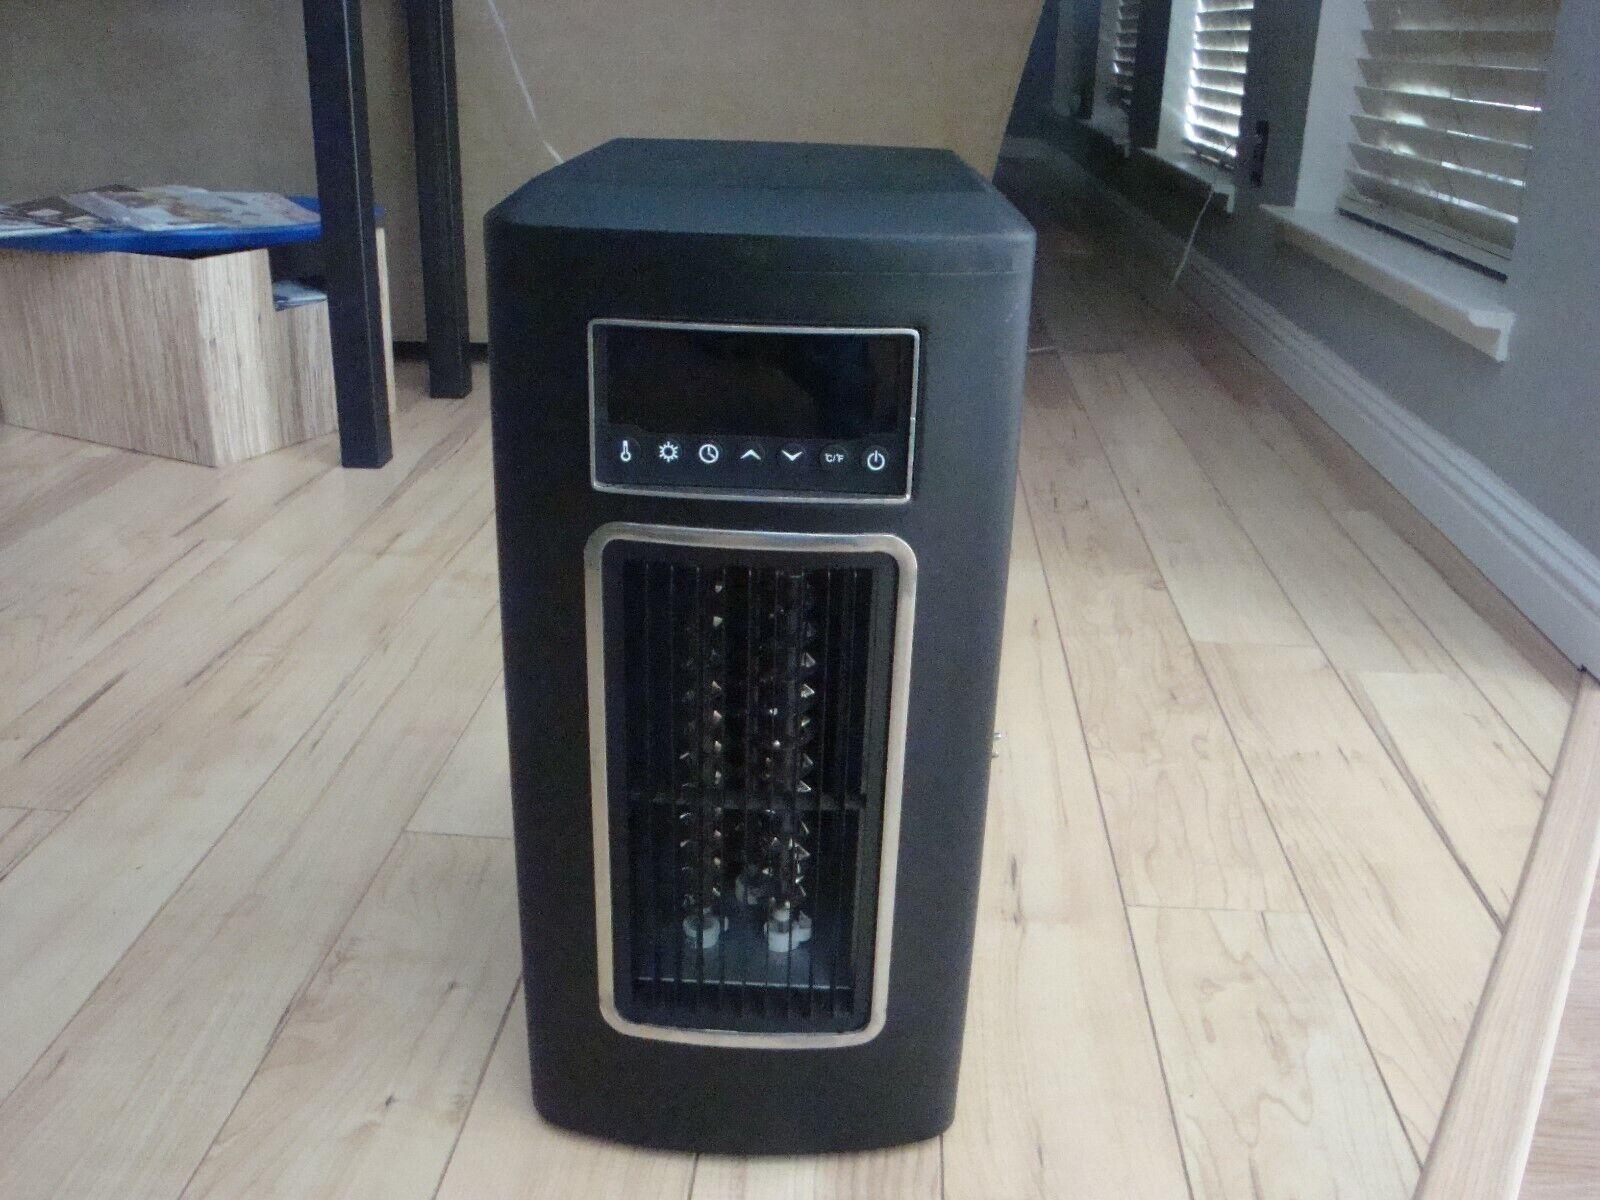 Life Pro Infrared Quartz Heater Model Ls 3w Bpiqt 1500 Watt With Remote Control For Sale Online